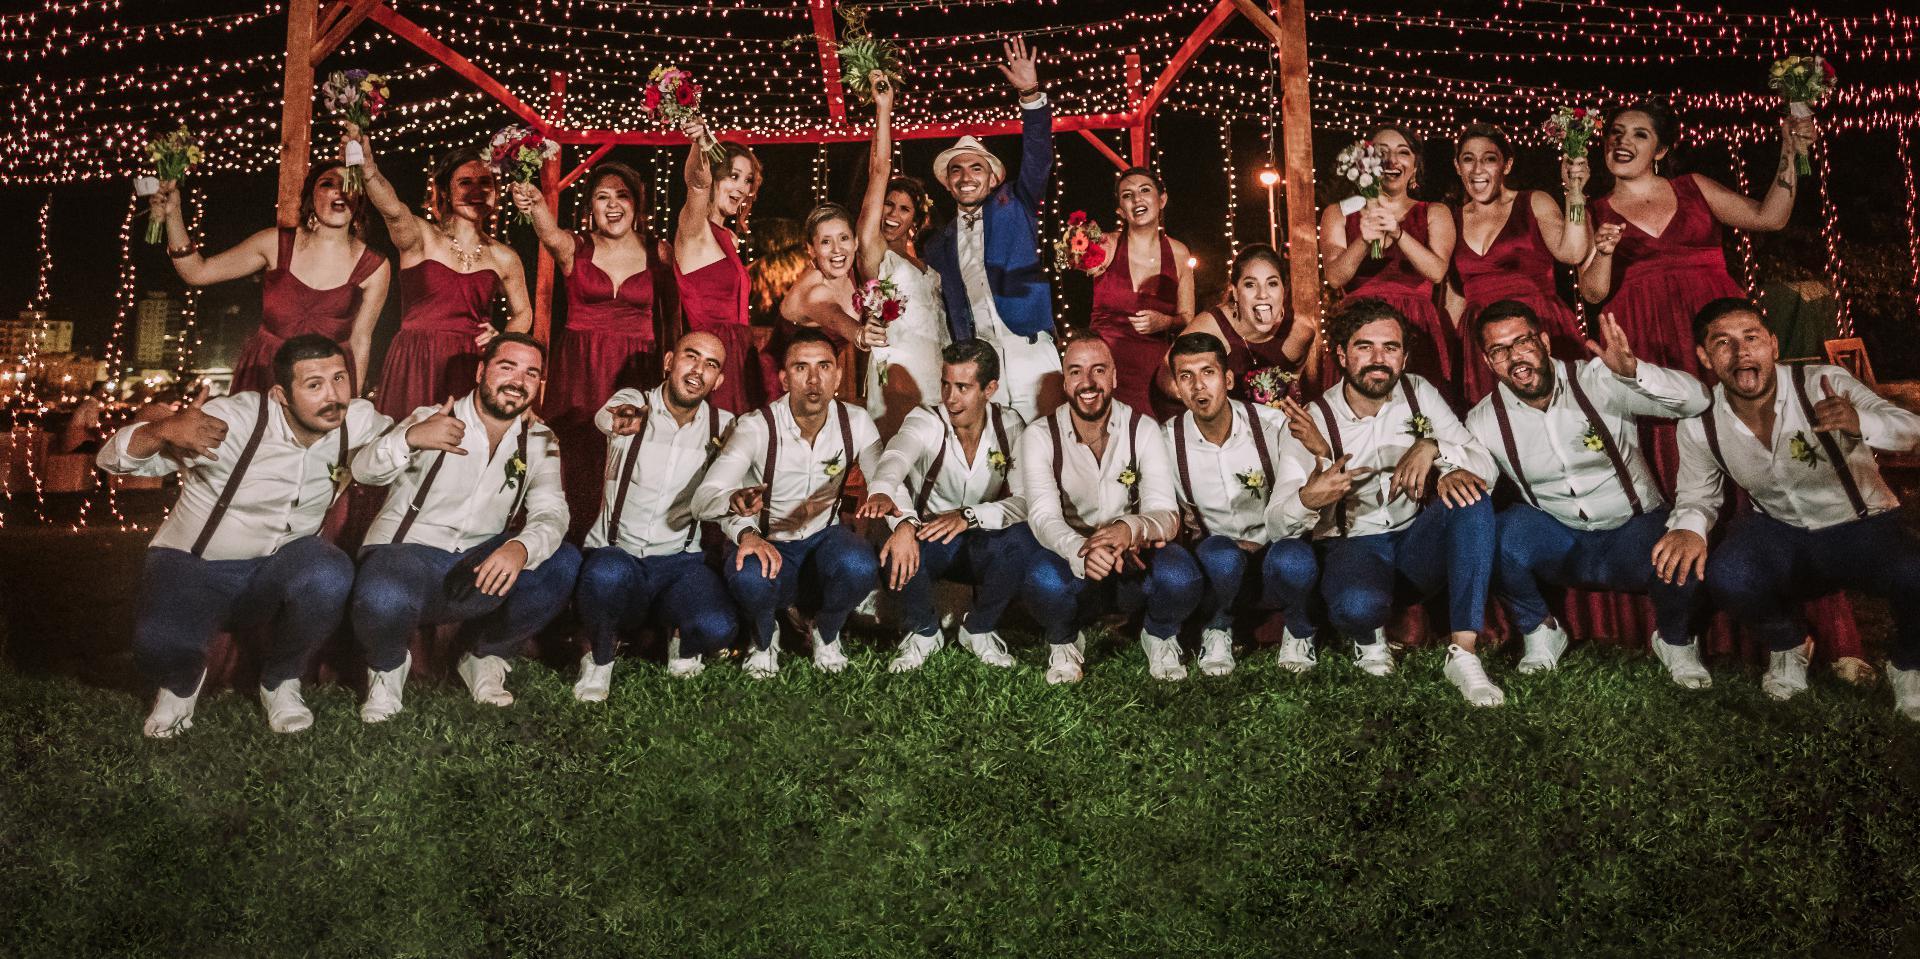 bodas-sin-clasificar-sin-tema-cuba-29471.jpg